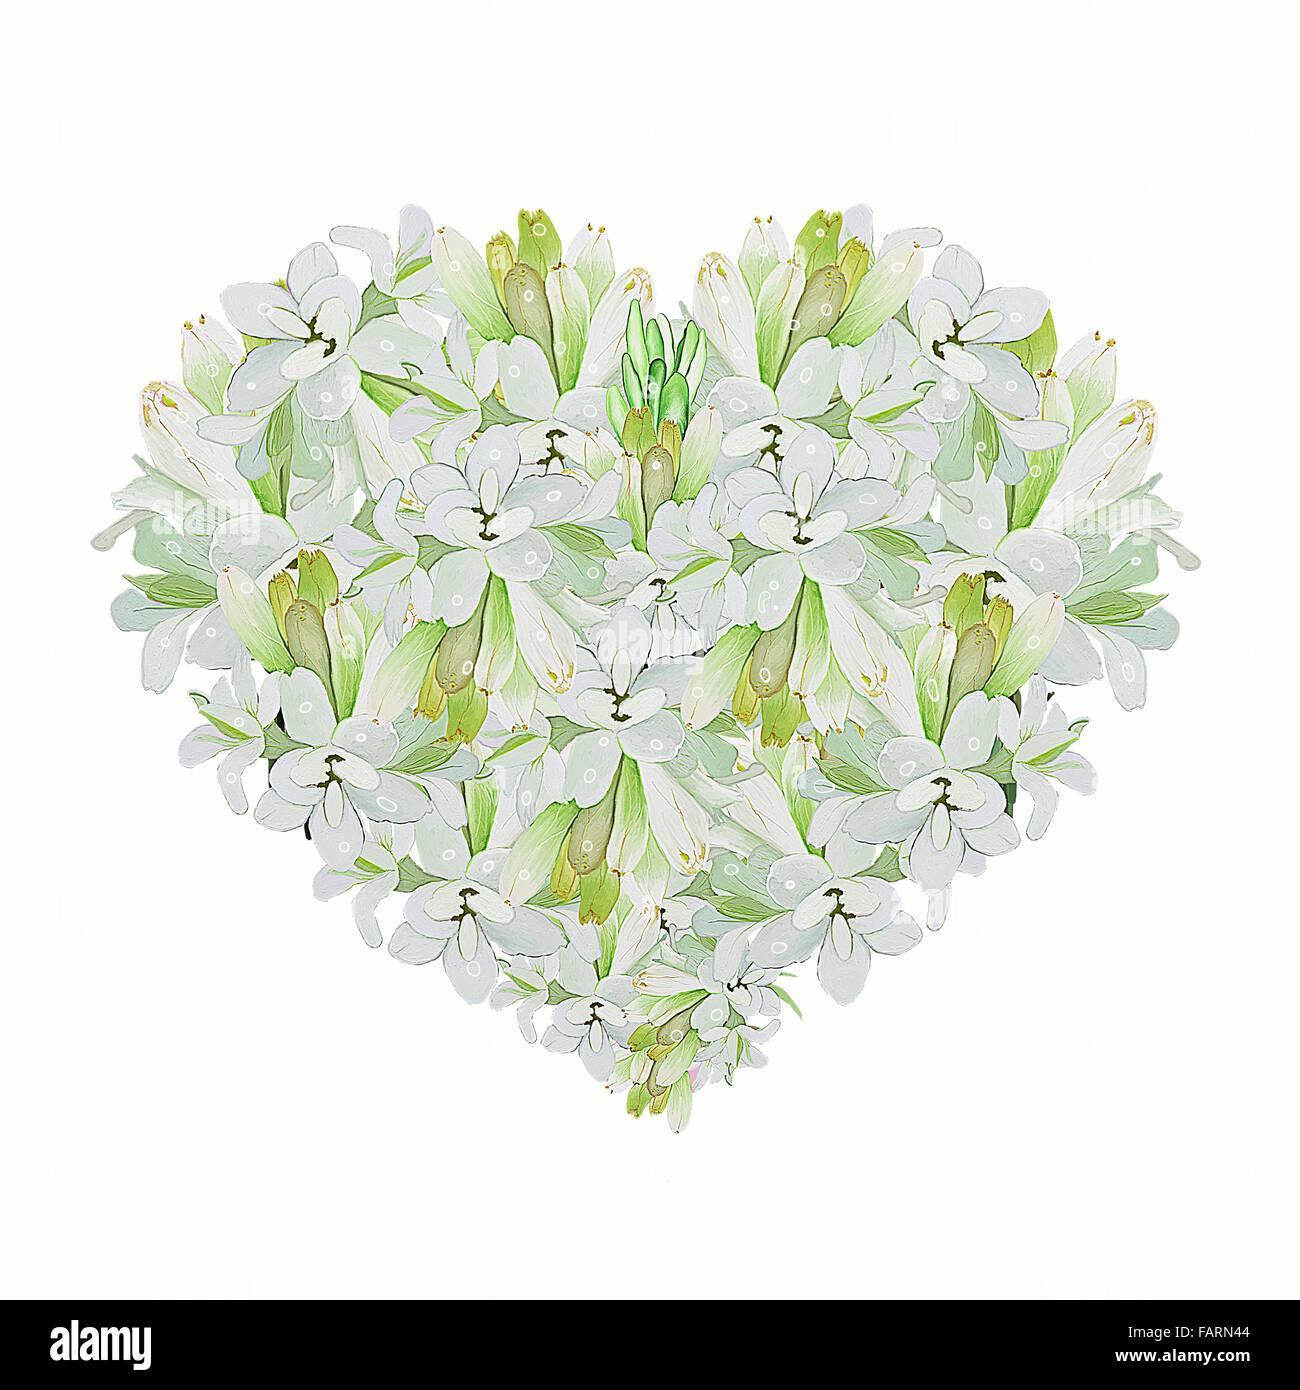 A Beautiful Heart Shape Of White Tuberose Flower On A White Stock